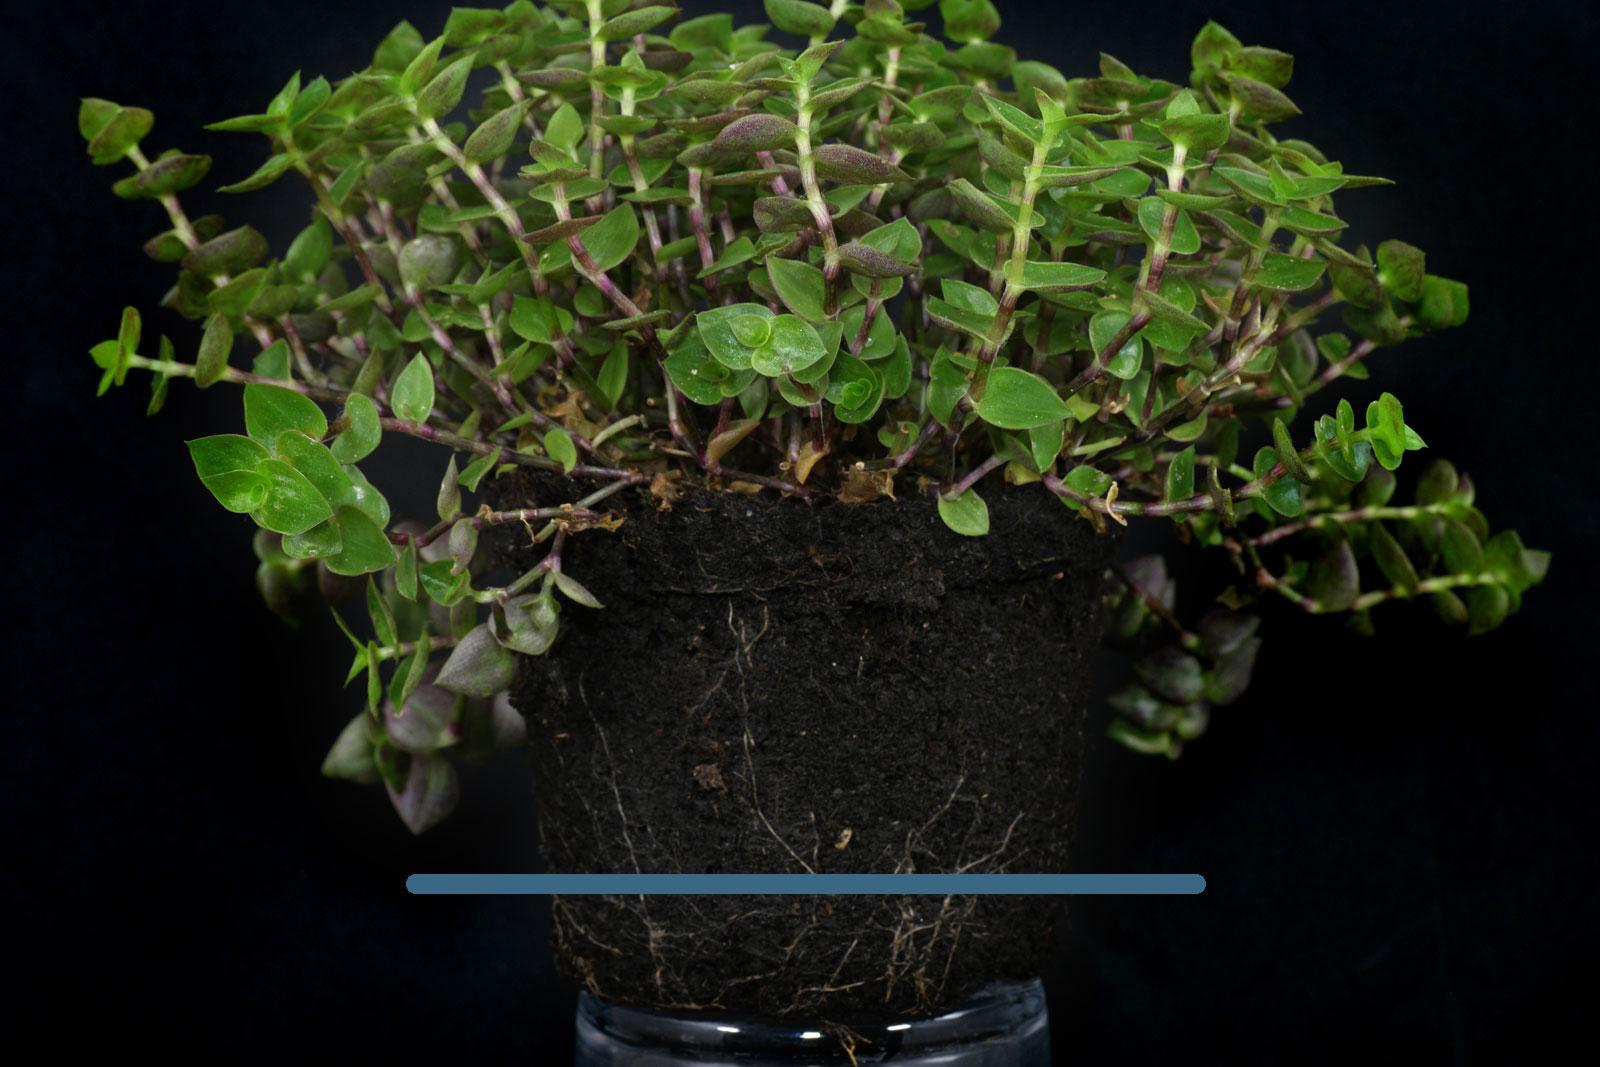 Callisia roots